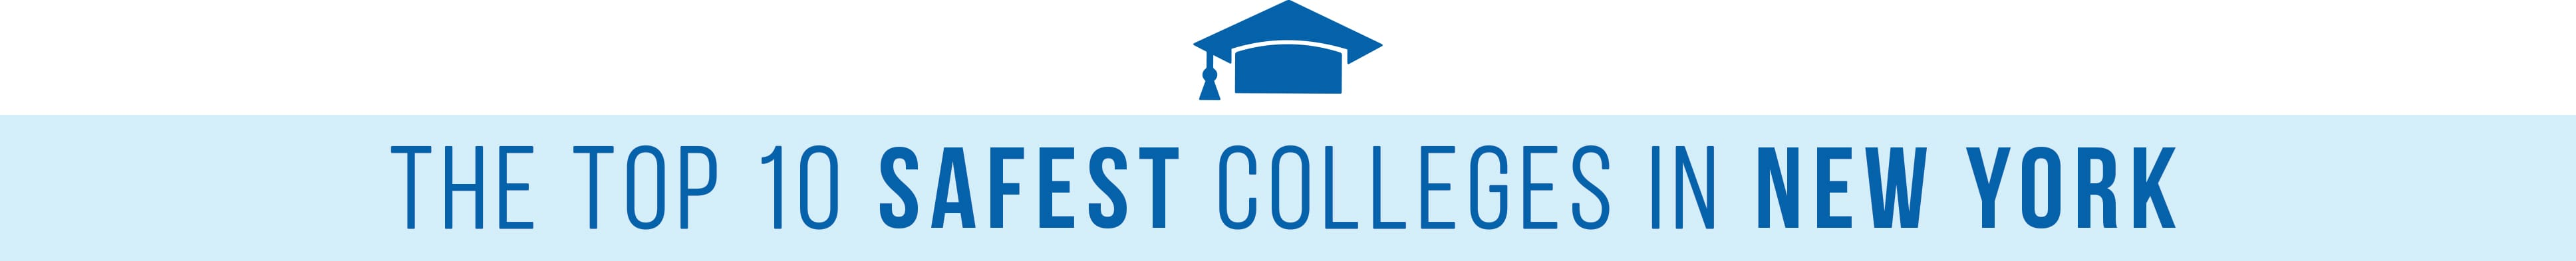 safest college campuses NY header